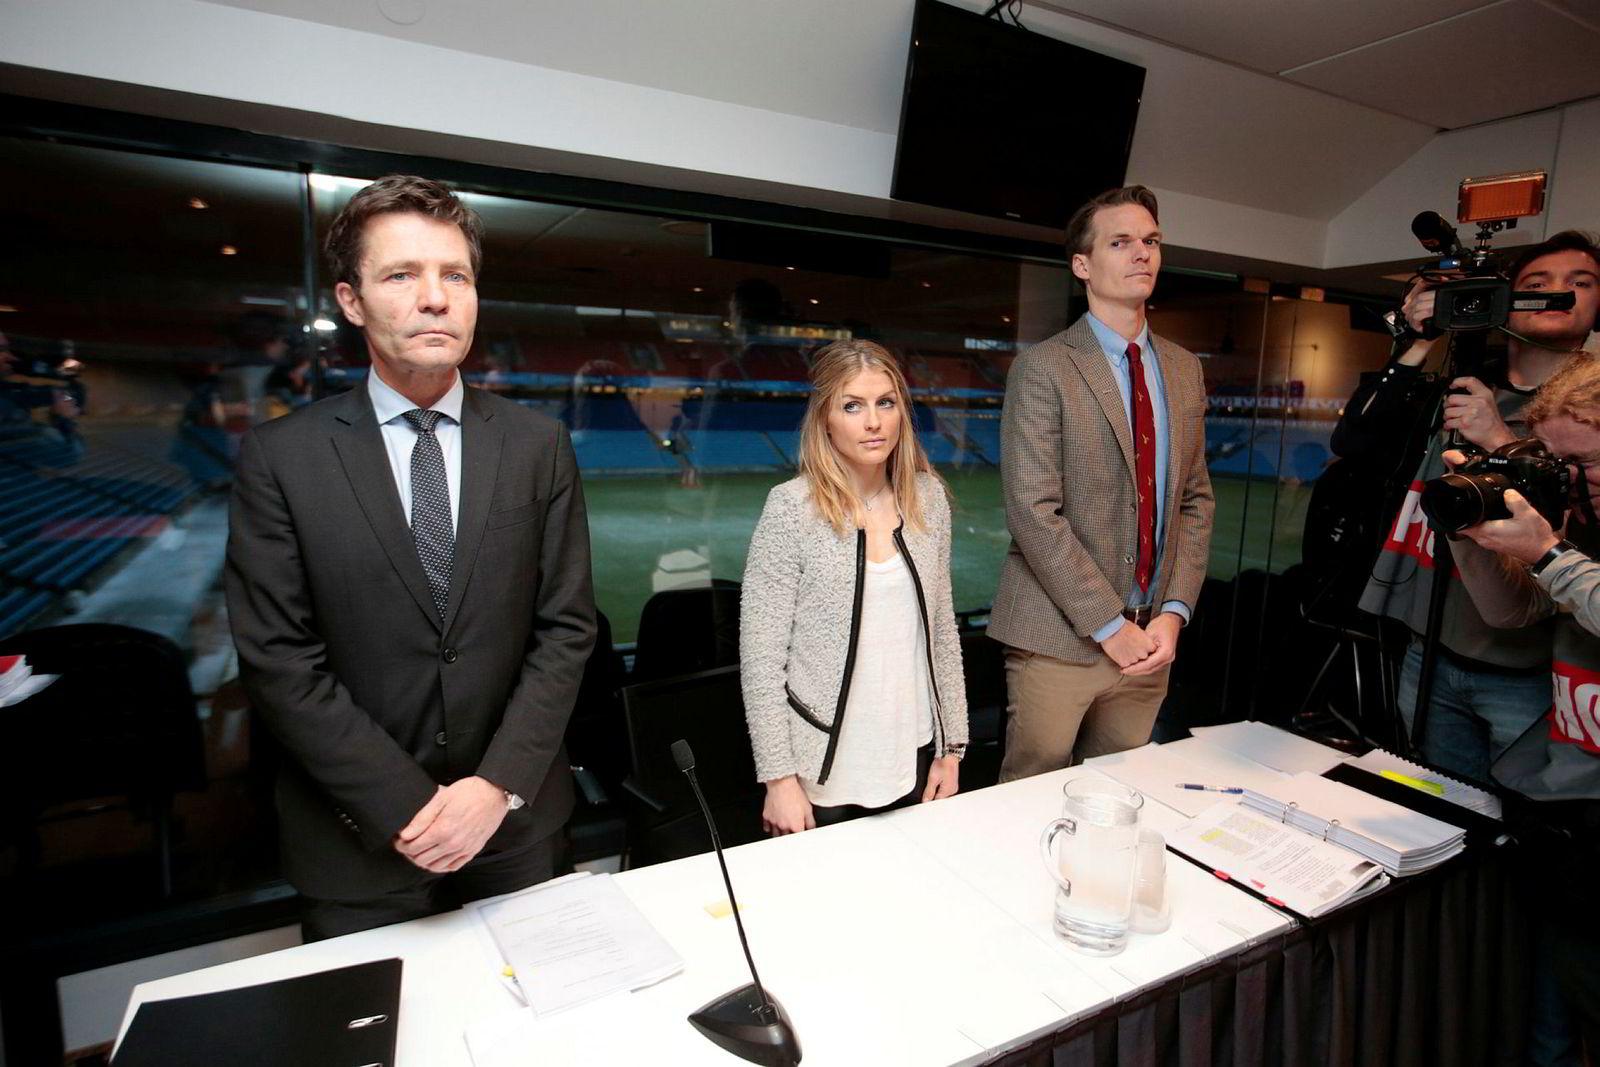 Therese Johaug sammen med sine advokater Christian B. Hjort (t.v) og Mikkel Toft Gimse (t.h) under høringen i dopingsaken på Ullevaal stadion i januar.